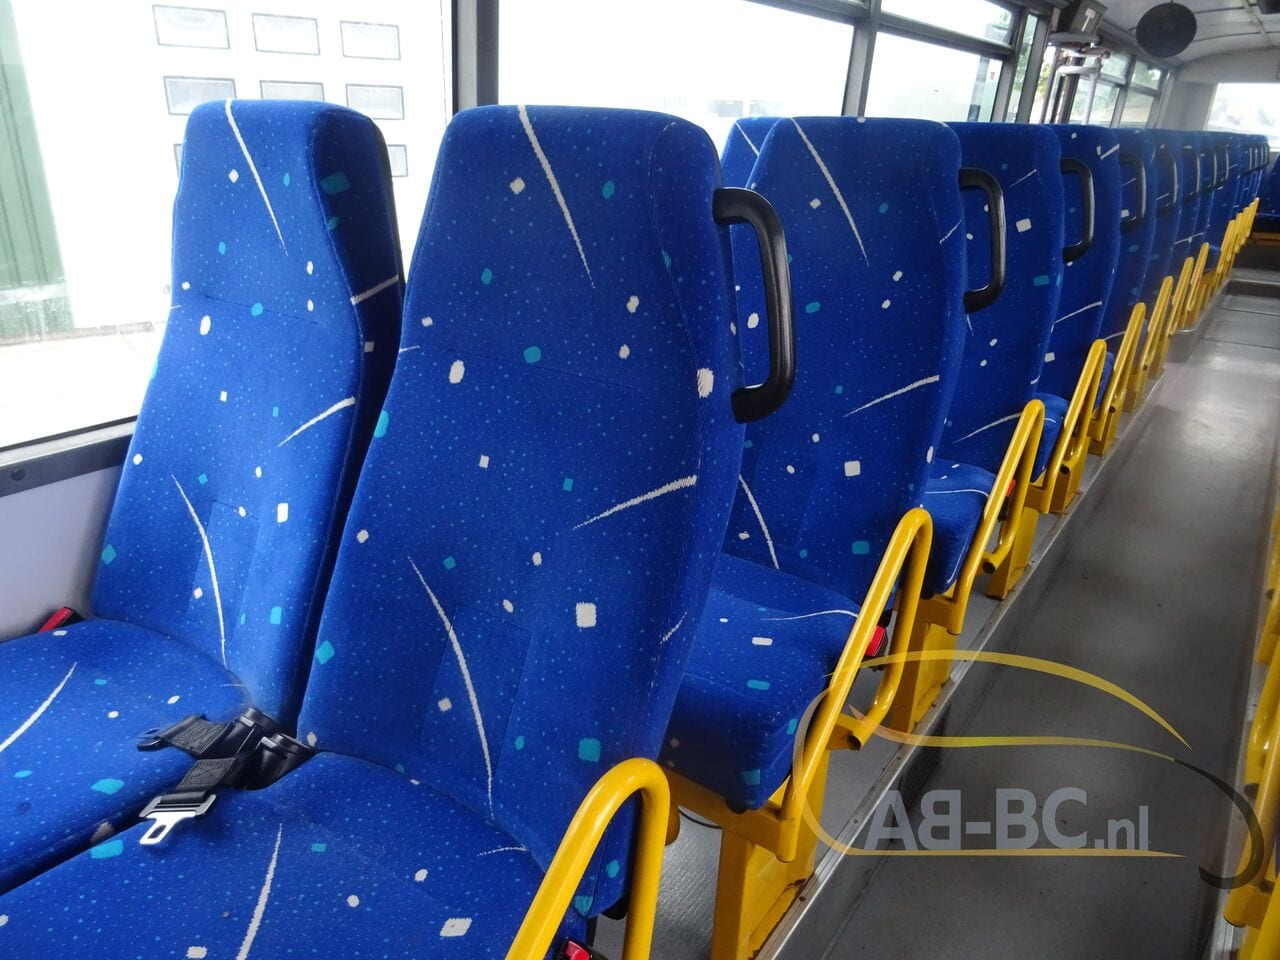 interurban-busIVECO-Irisbus-Recreo-64-Seats---1626160121850930556_big_1b397177091d4bf64500ee07b920fe7e--21071309575983154500